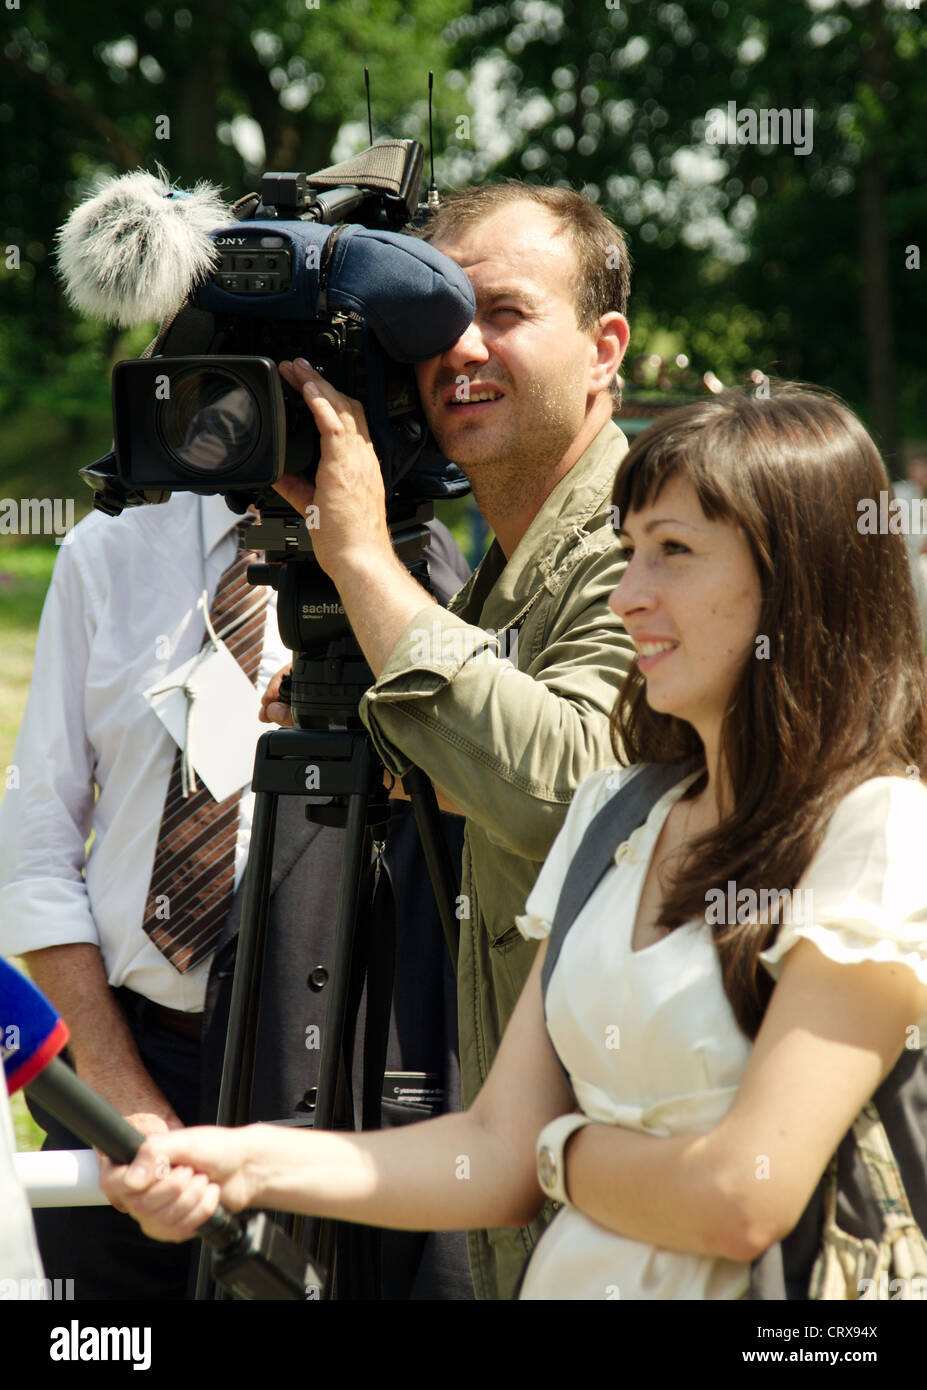 Kameramann und Korrespondent Stockbild